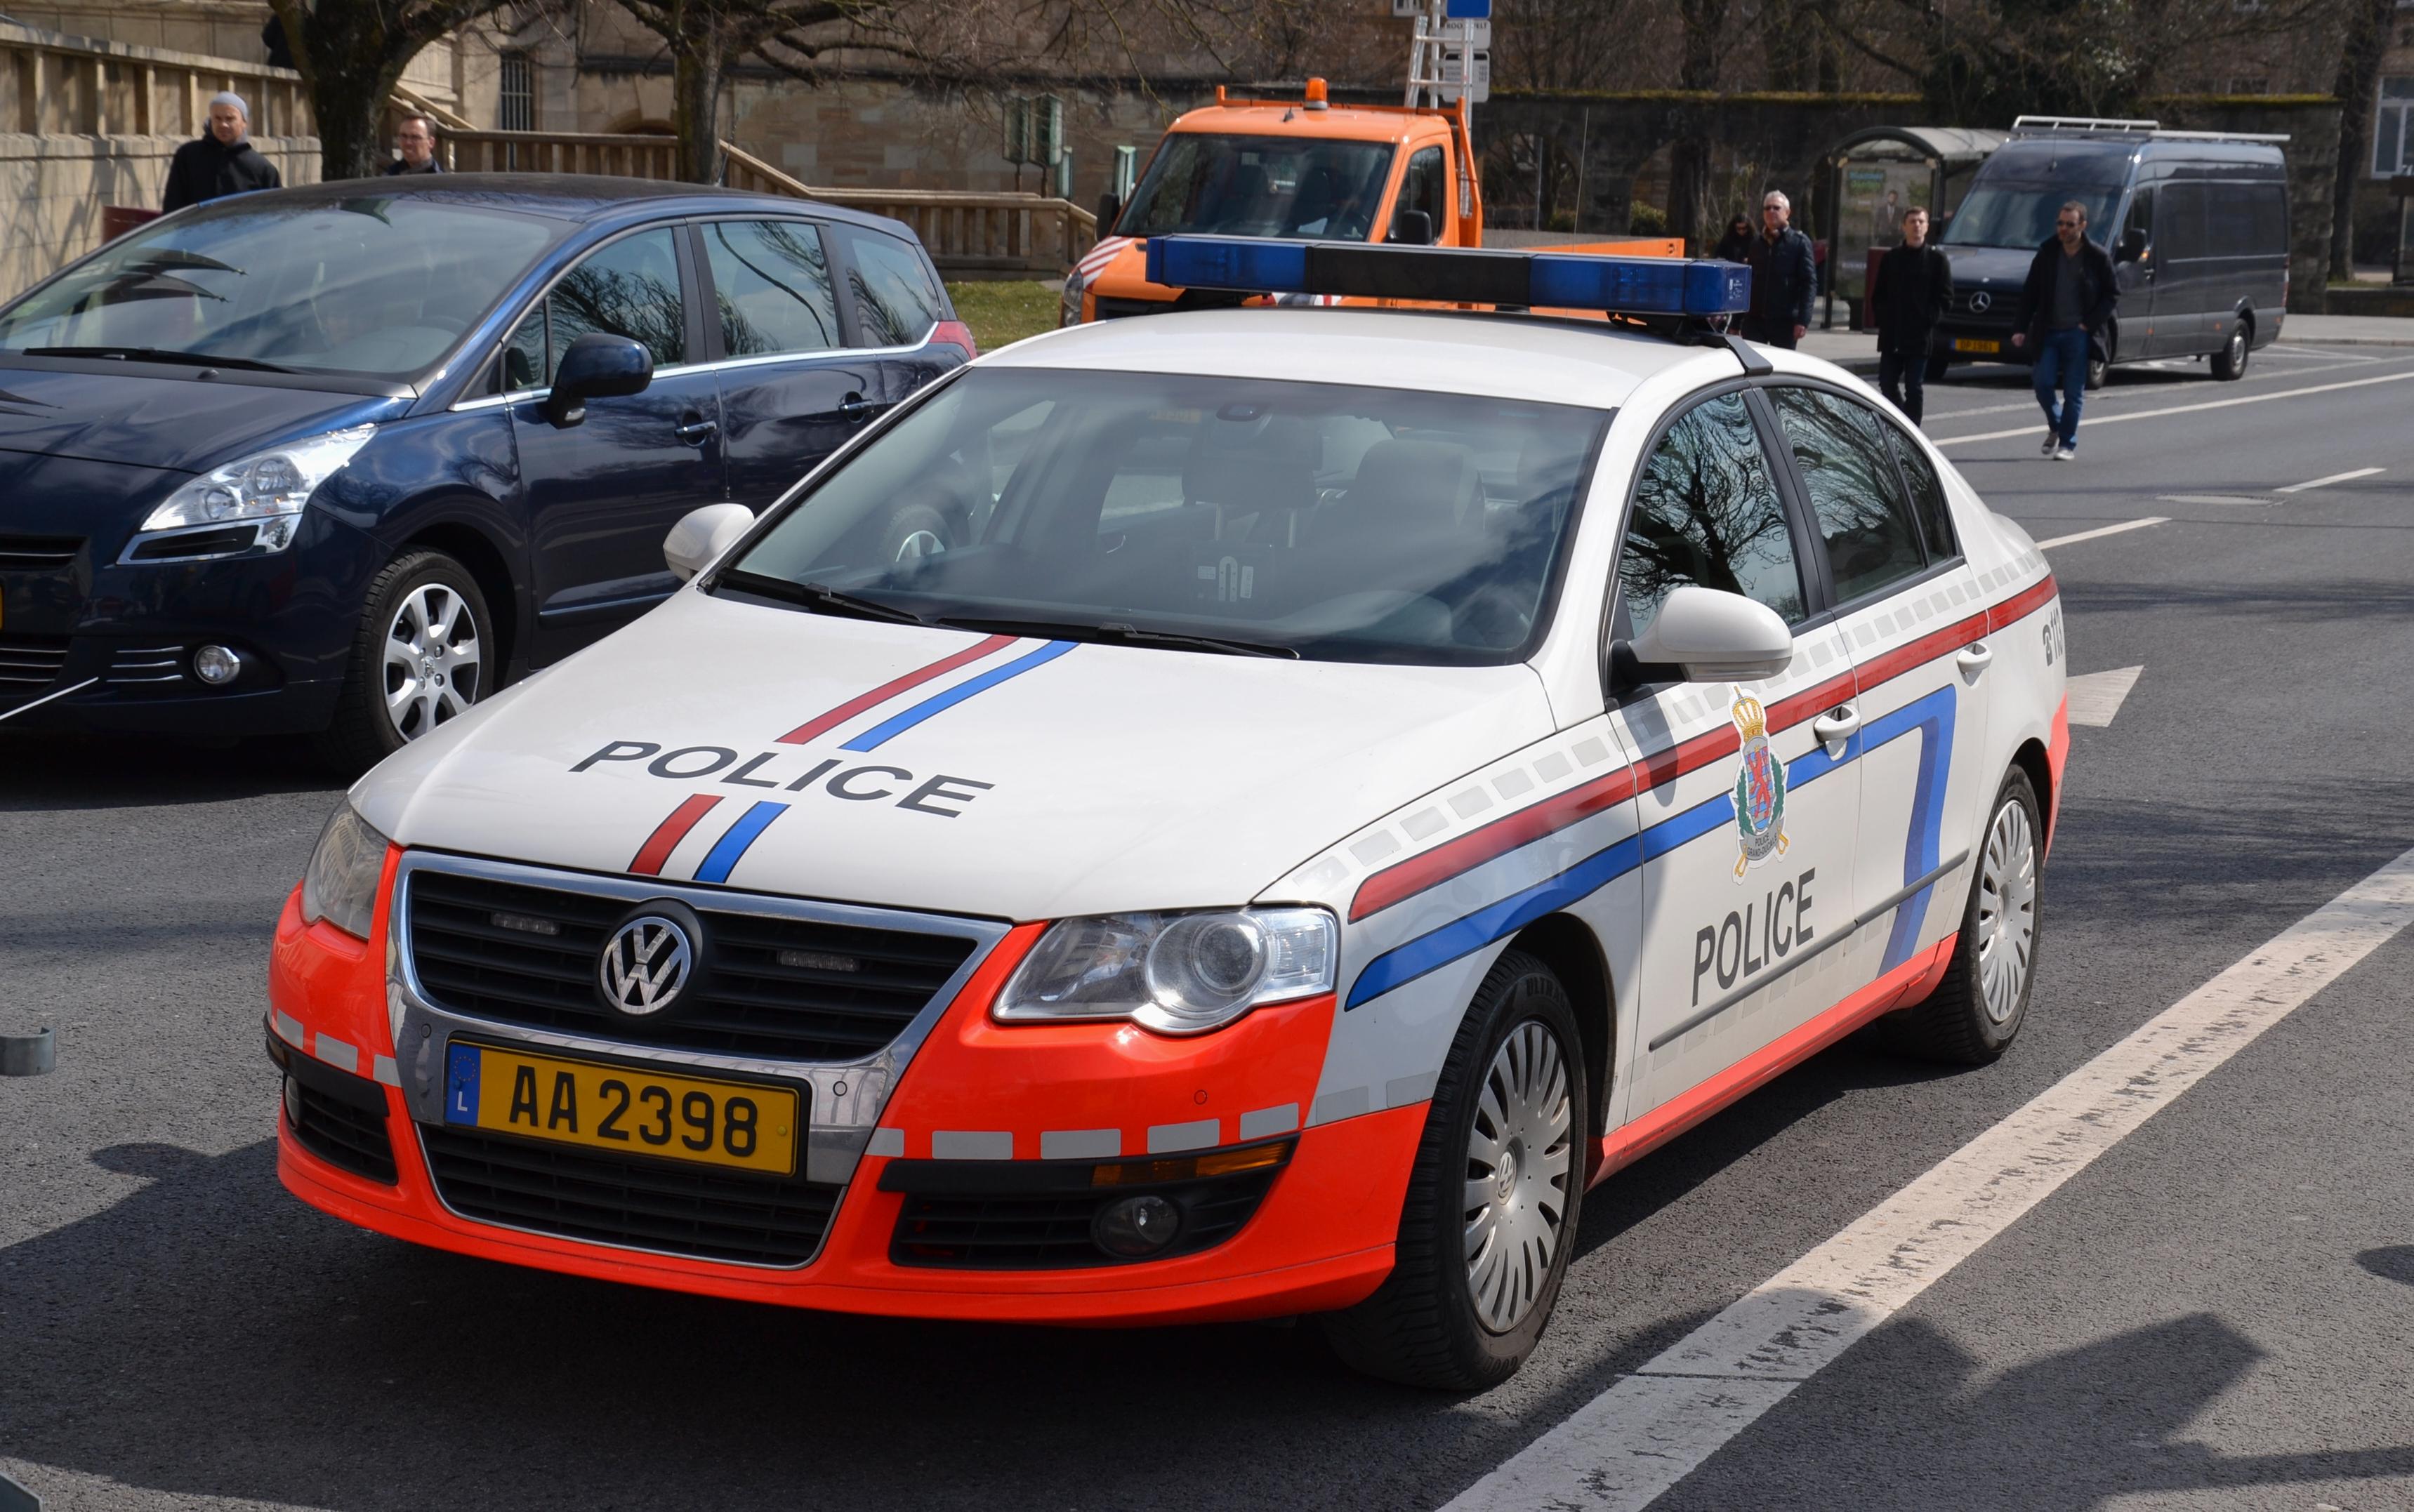 file grand ducal police car vw jpg wikimedia commons. Black Bedroom Furniture Sets. Home Design Ideas